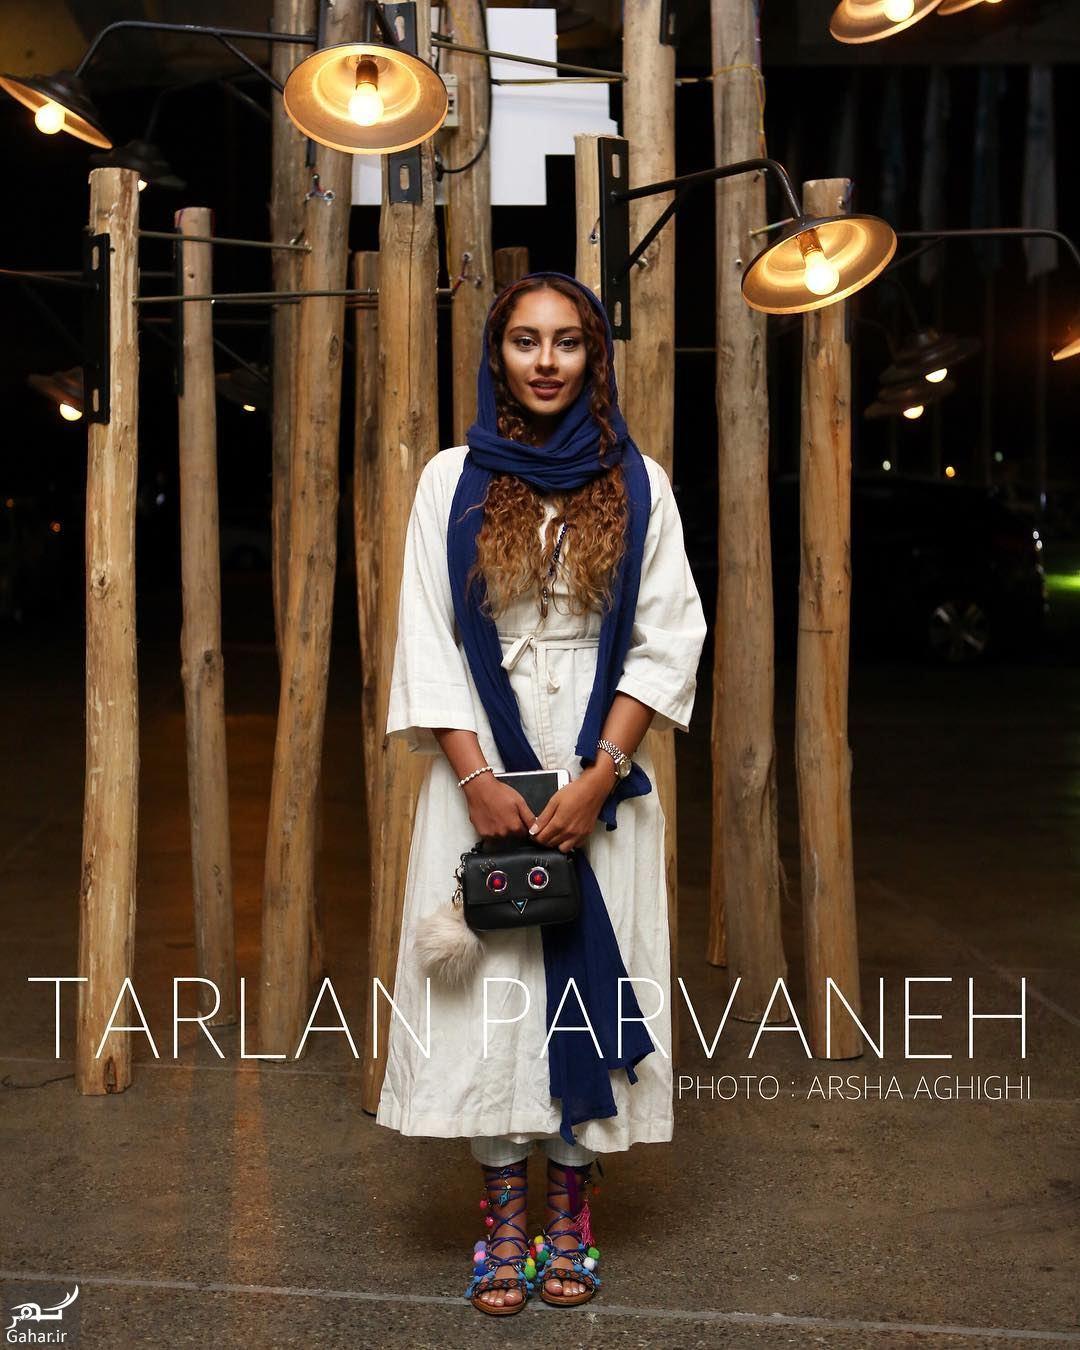 487832 Gahar ir عکس/ تیپ خاص ترلان پروانه در ششمین جشنواره فیلم شهر